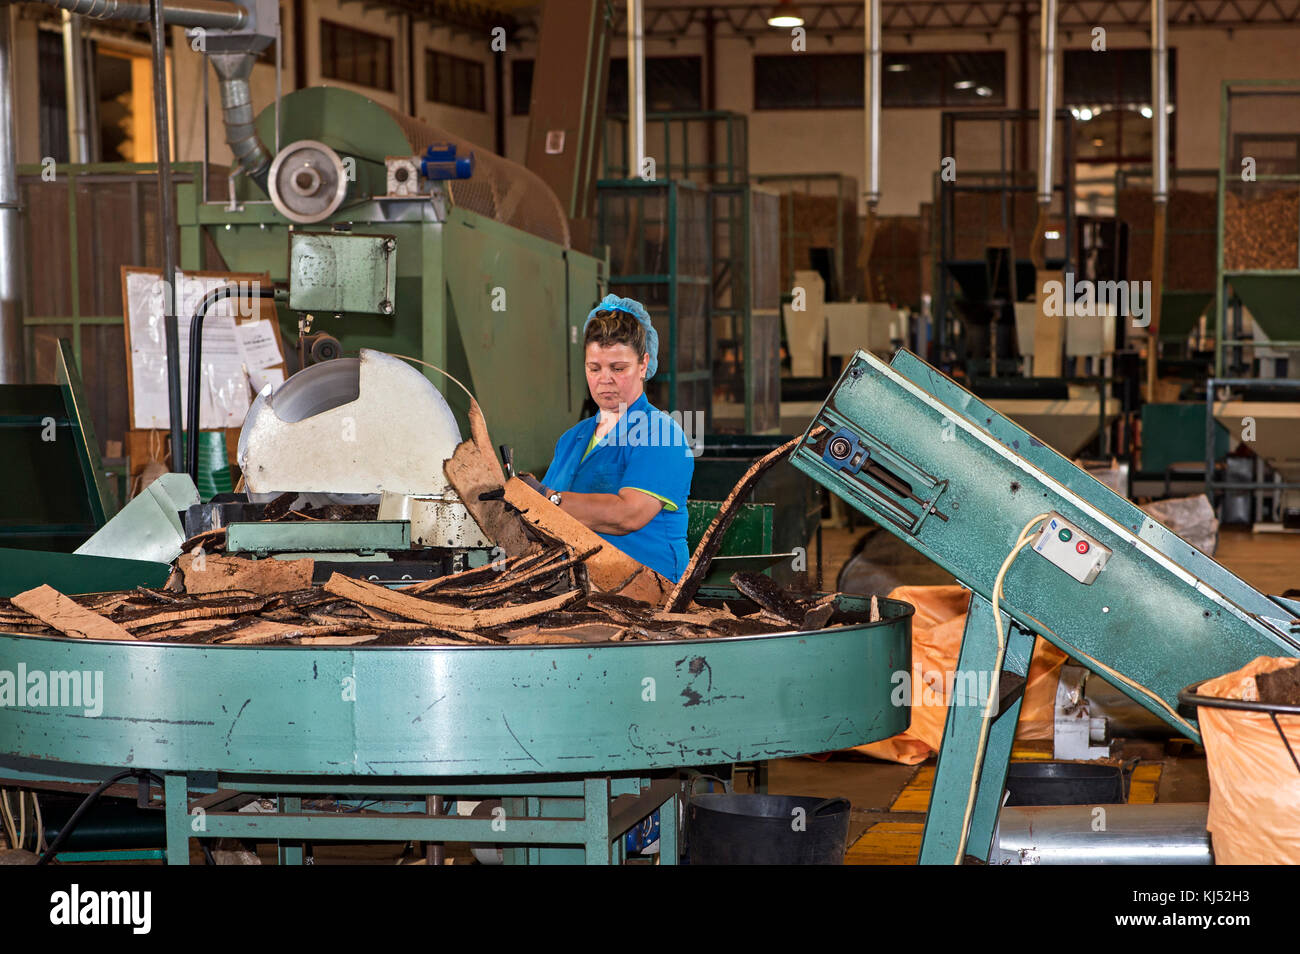 Female worker operating a cutting machine for cork oak bark, Cork factory Nova Cortica, Sao Bras de Alportel, Algarve, - Stock Image